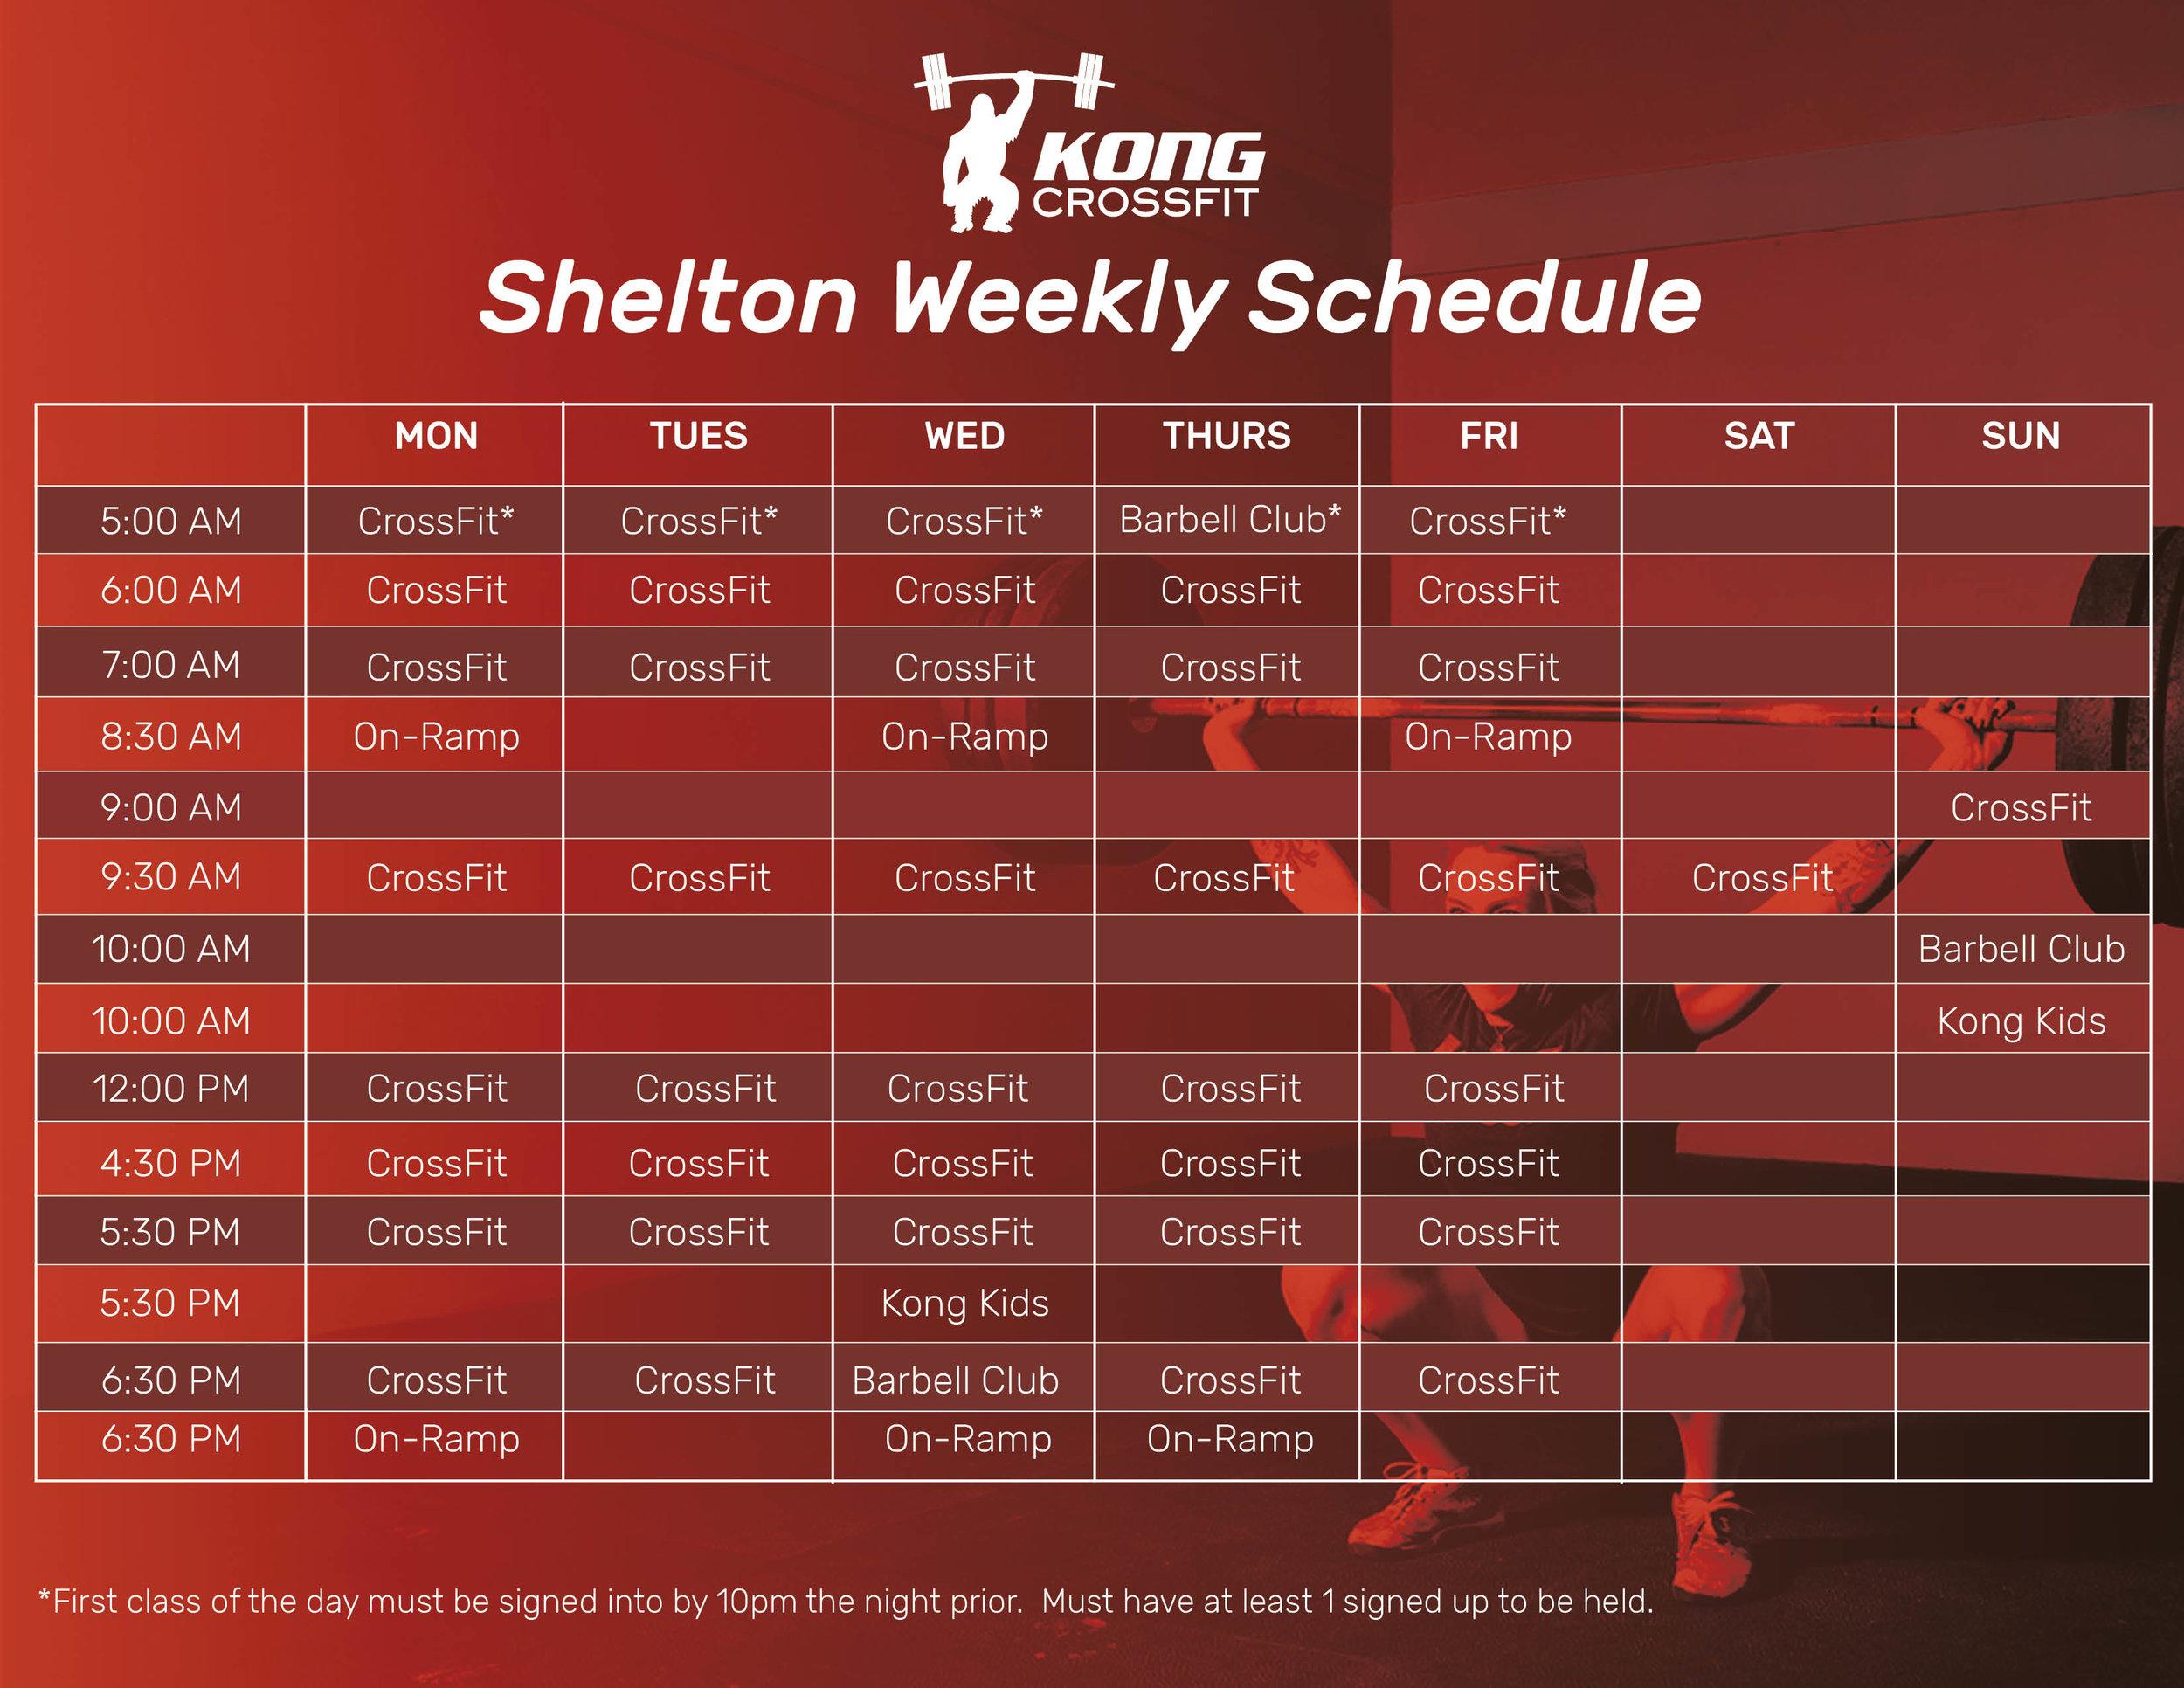 Schedule_Template_1-2-18_shelton.jpg